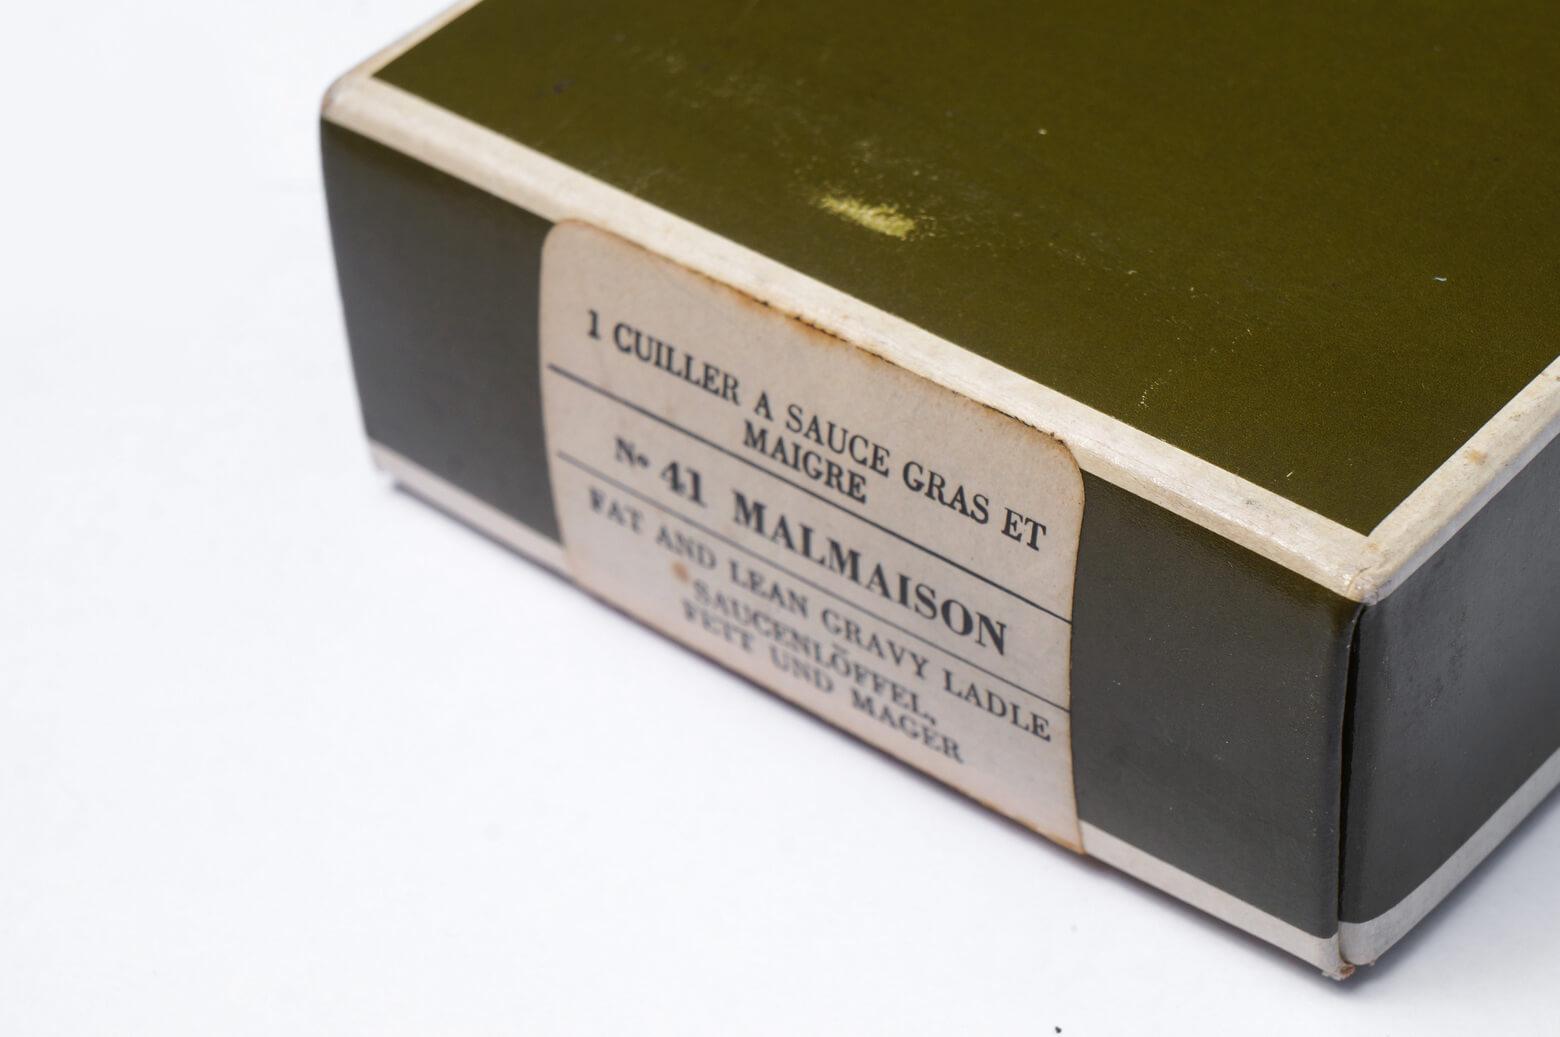 Christofle Malmaison Gravy Ladle/クリストフル マルメゾン グレイビー レードル